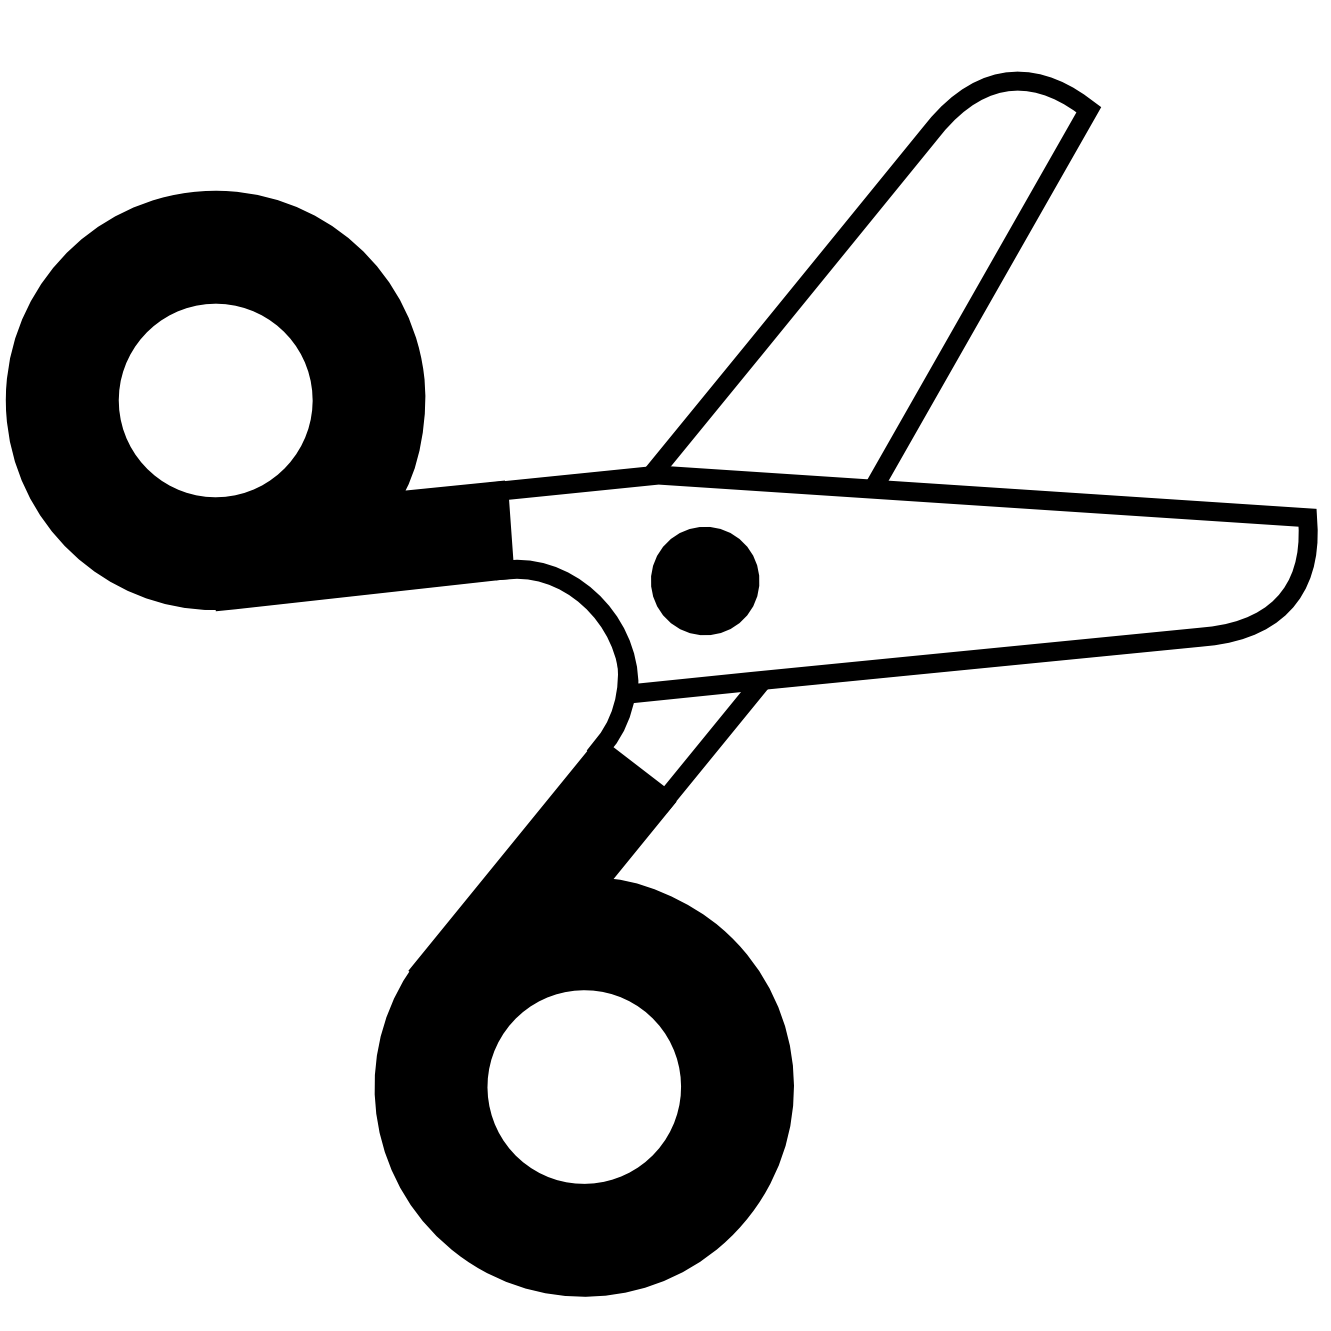 Black and white letters. Clipart scissors preschool